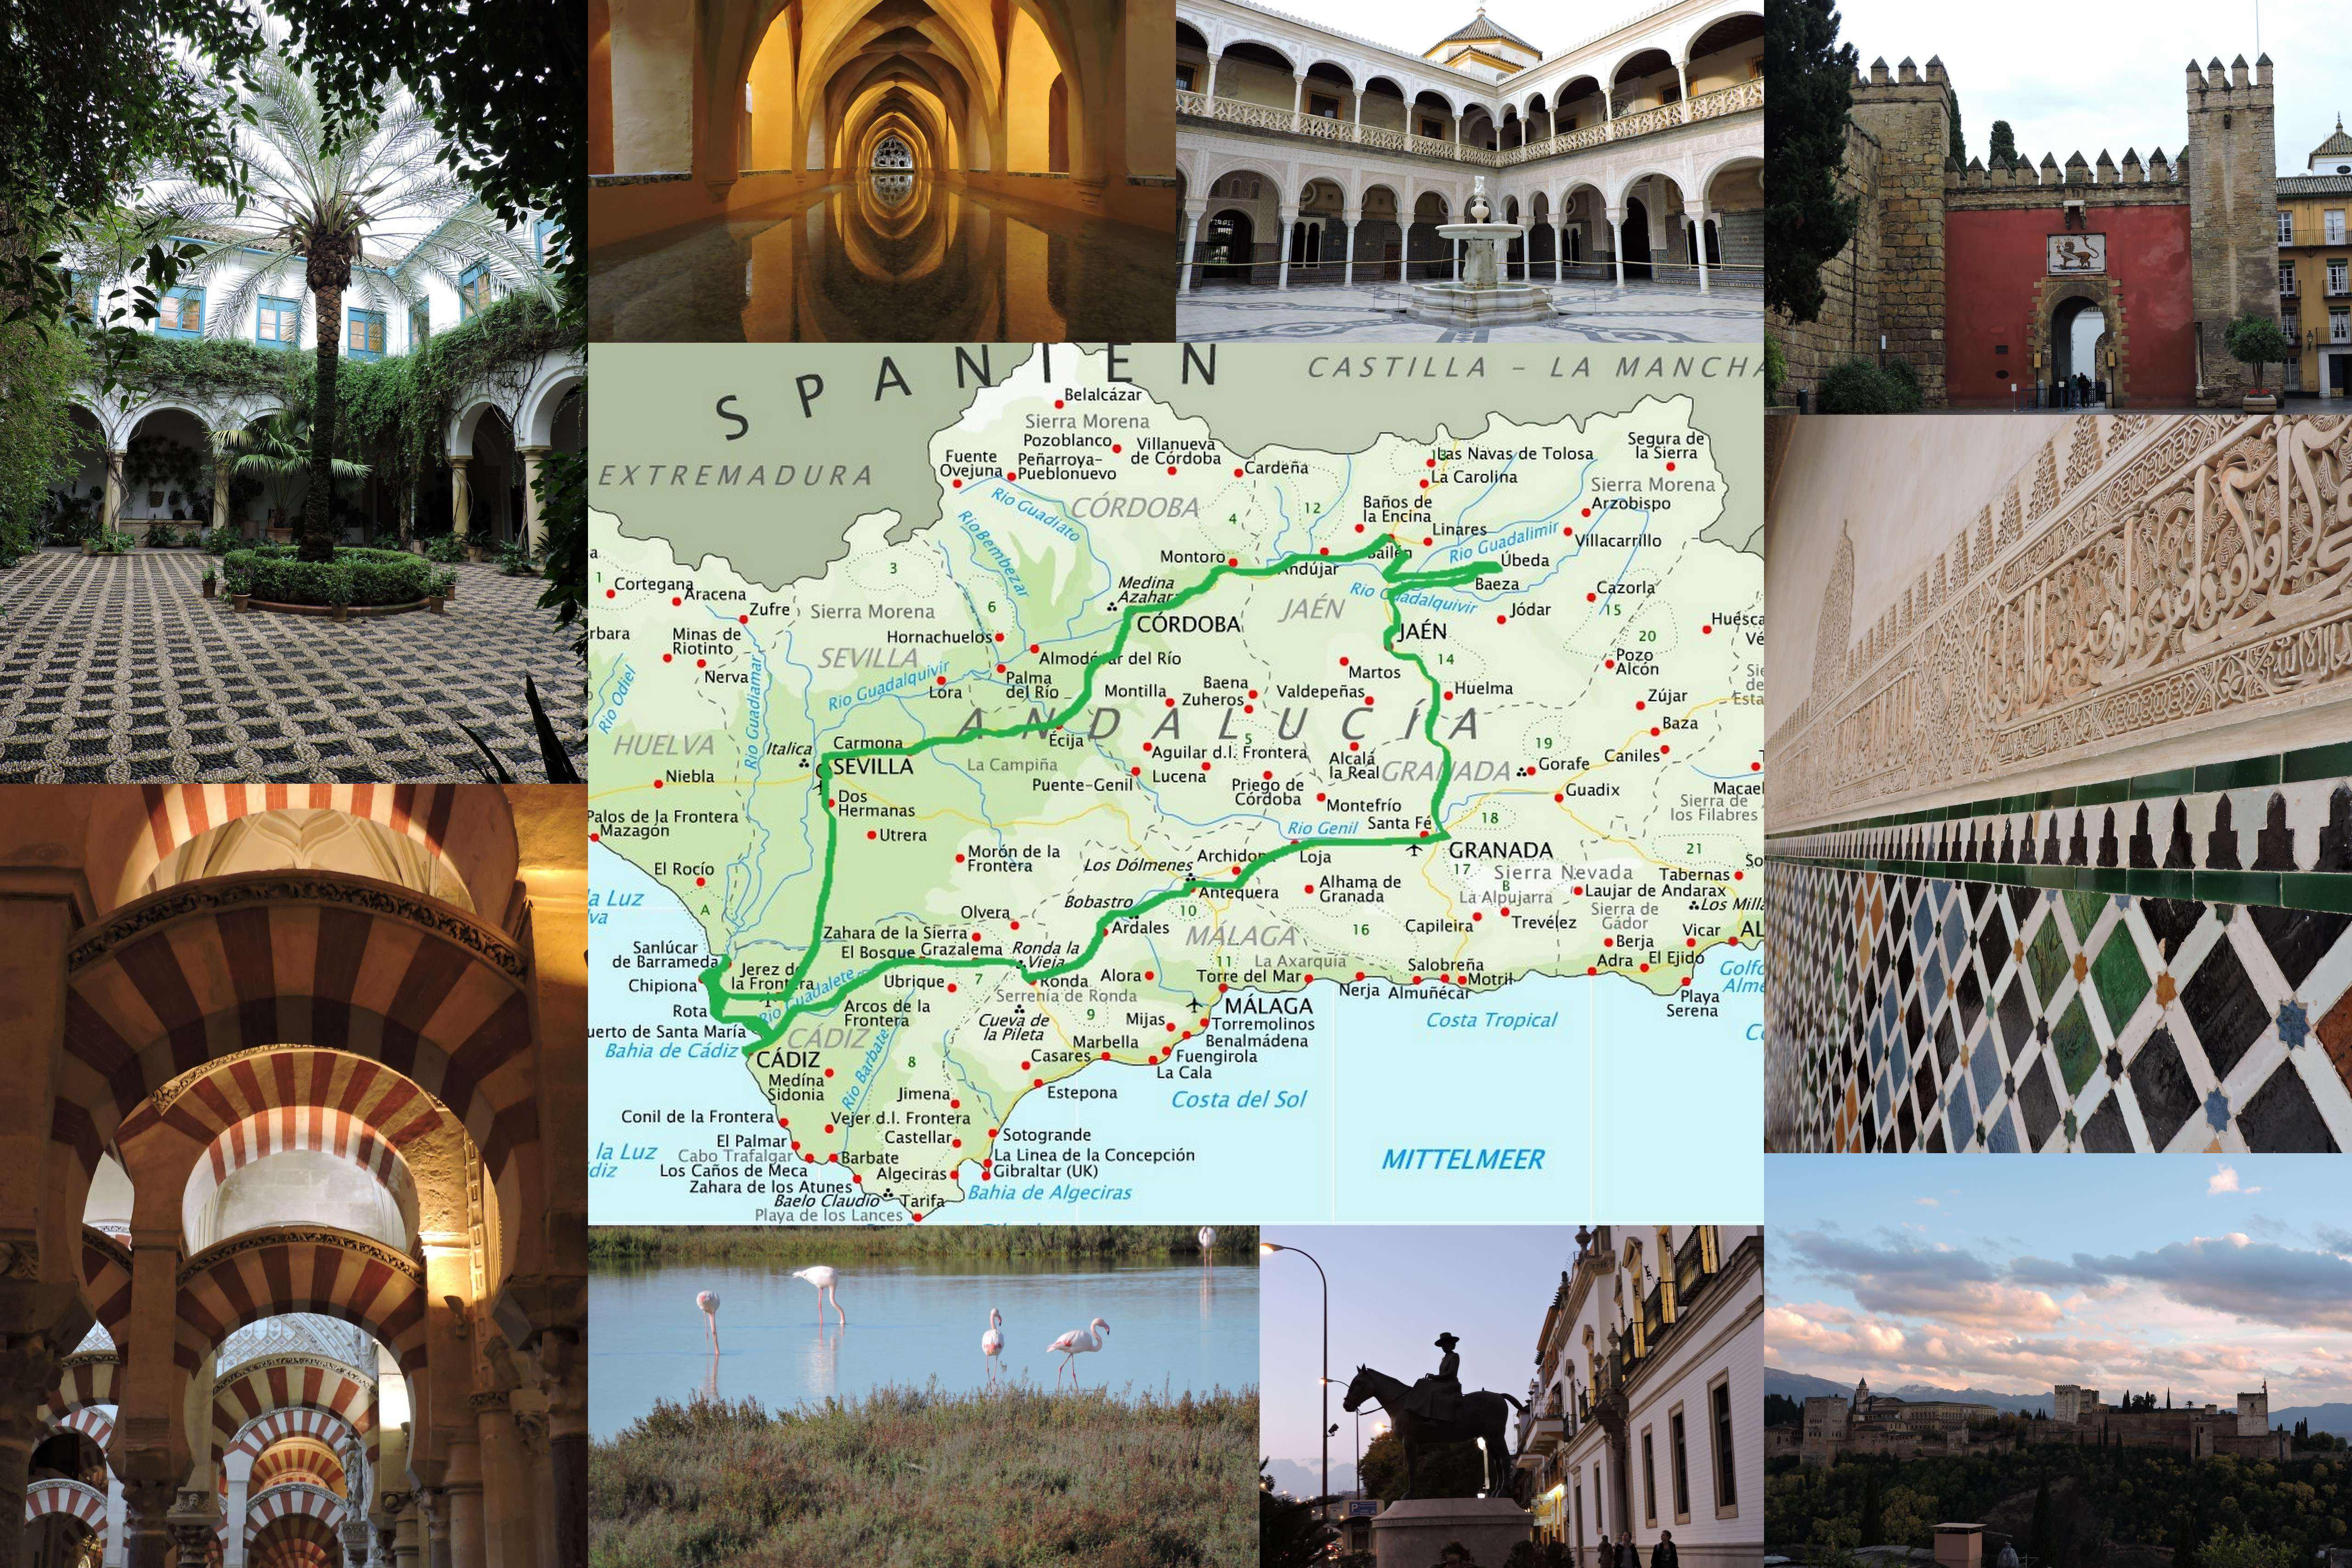 andalousie espagne itineraire roadtrip 1 semaine